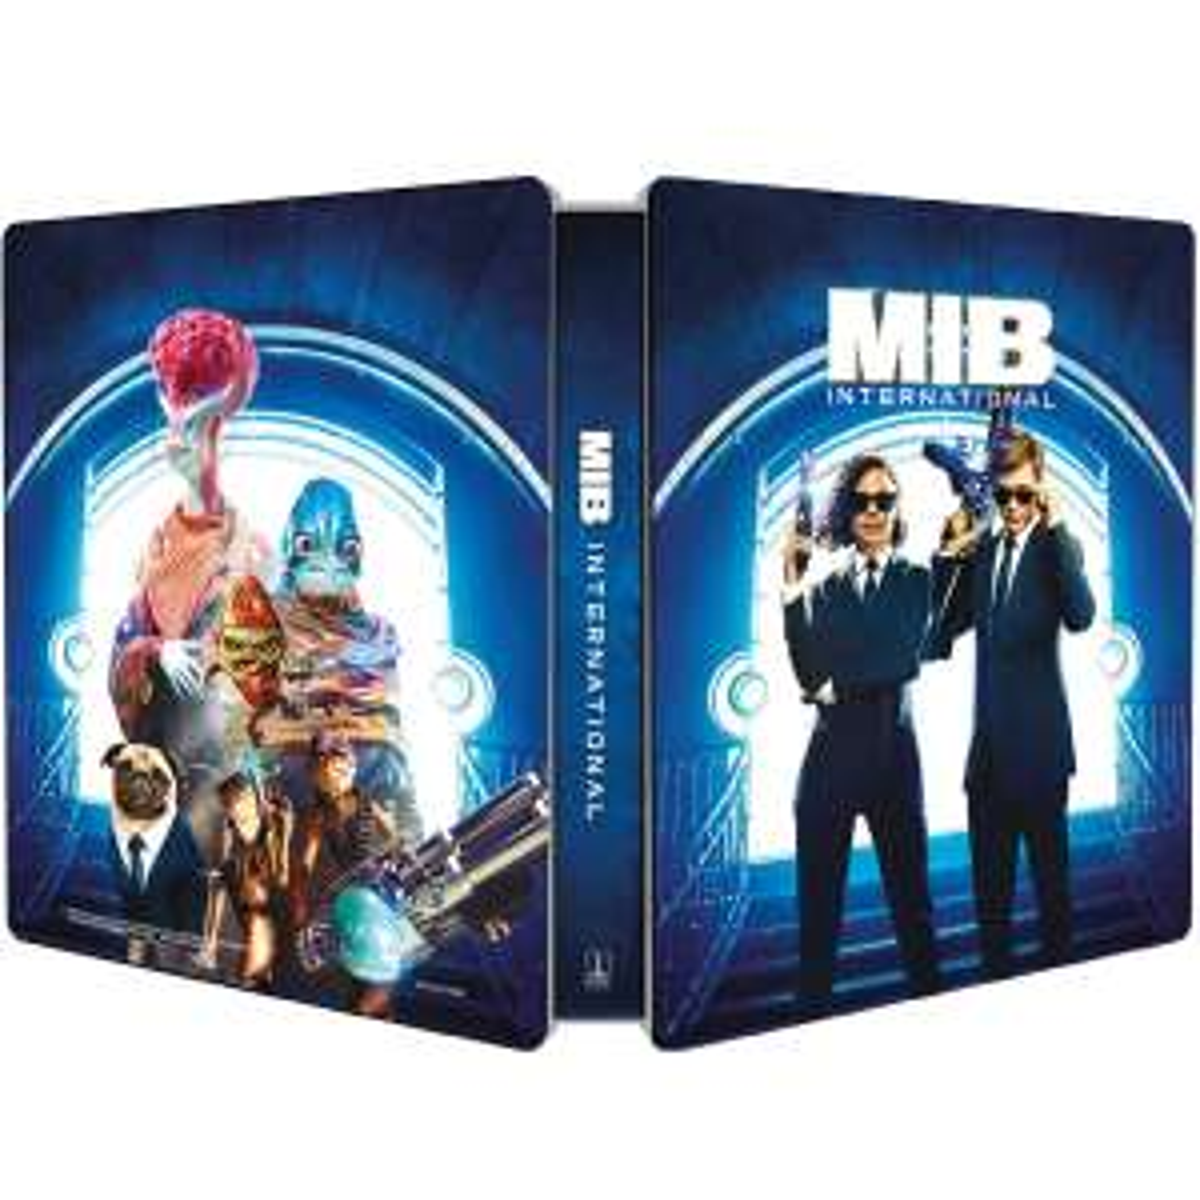 Men In Black: International (Limited Edition 4K Steelbook) [UHD] - £6.99 @ Zoom